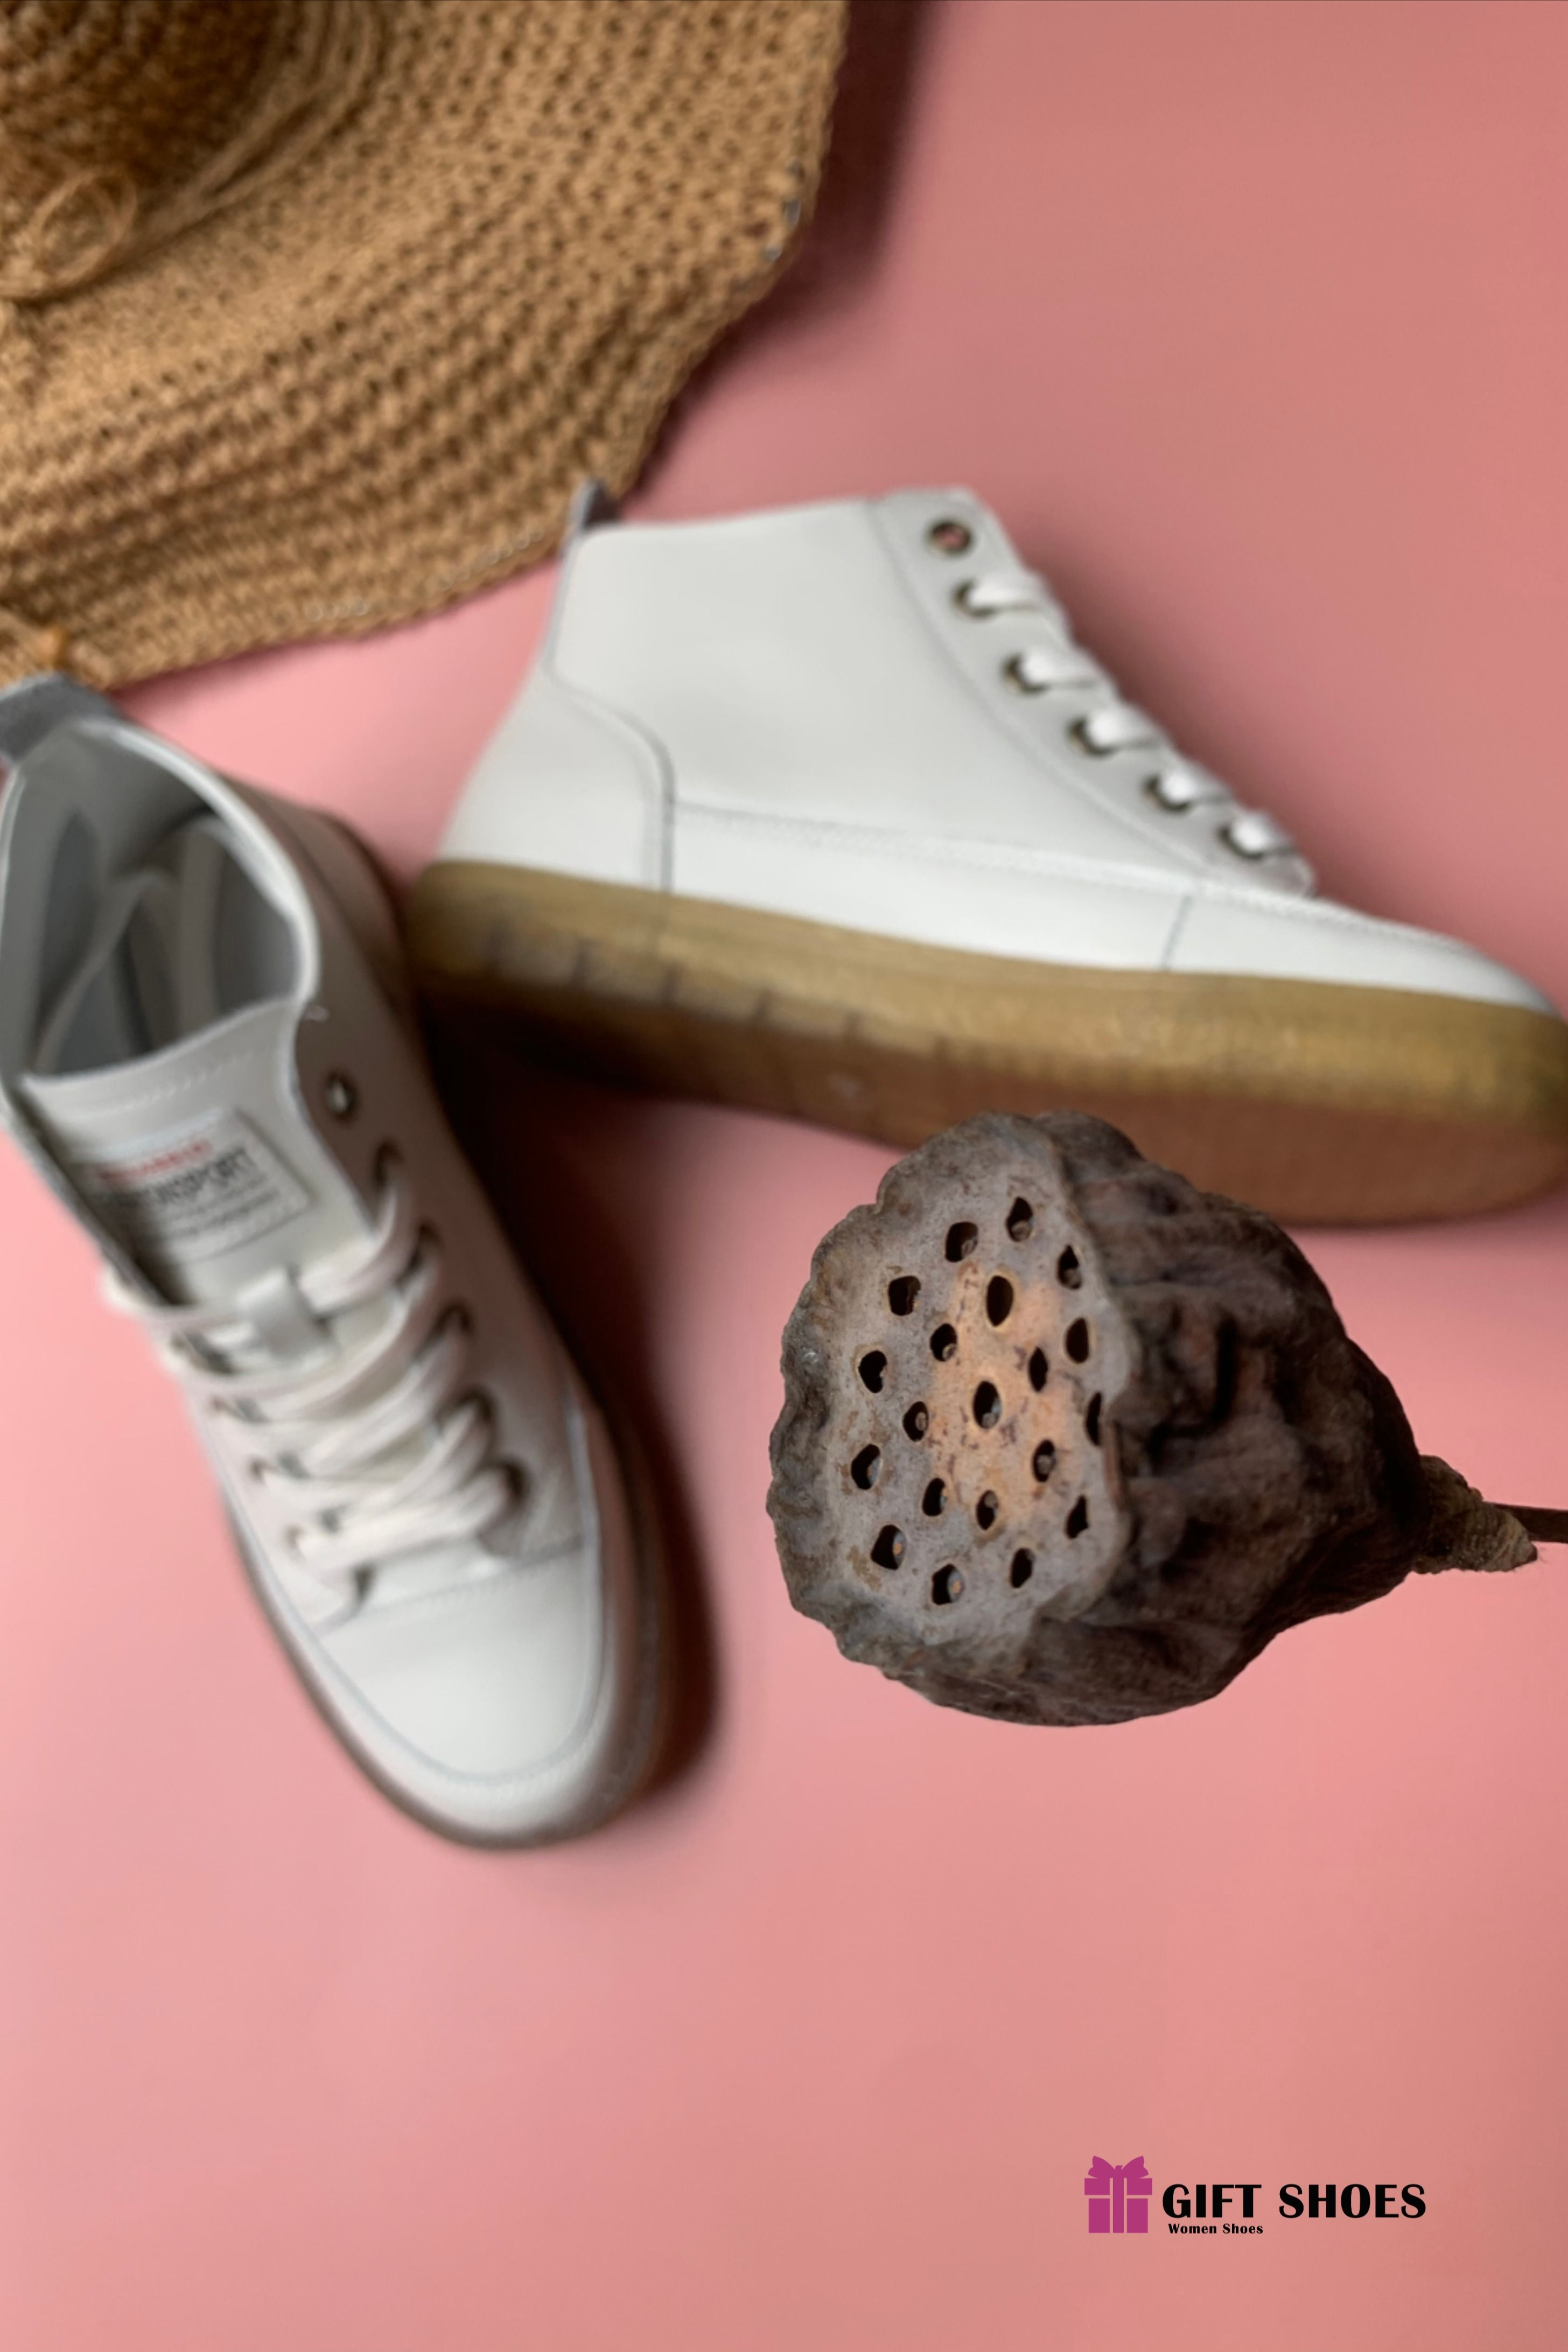 best website for women's shoes